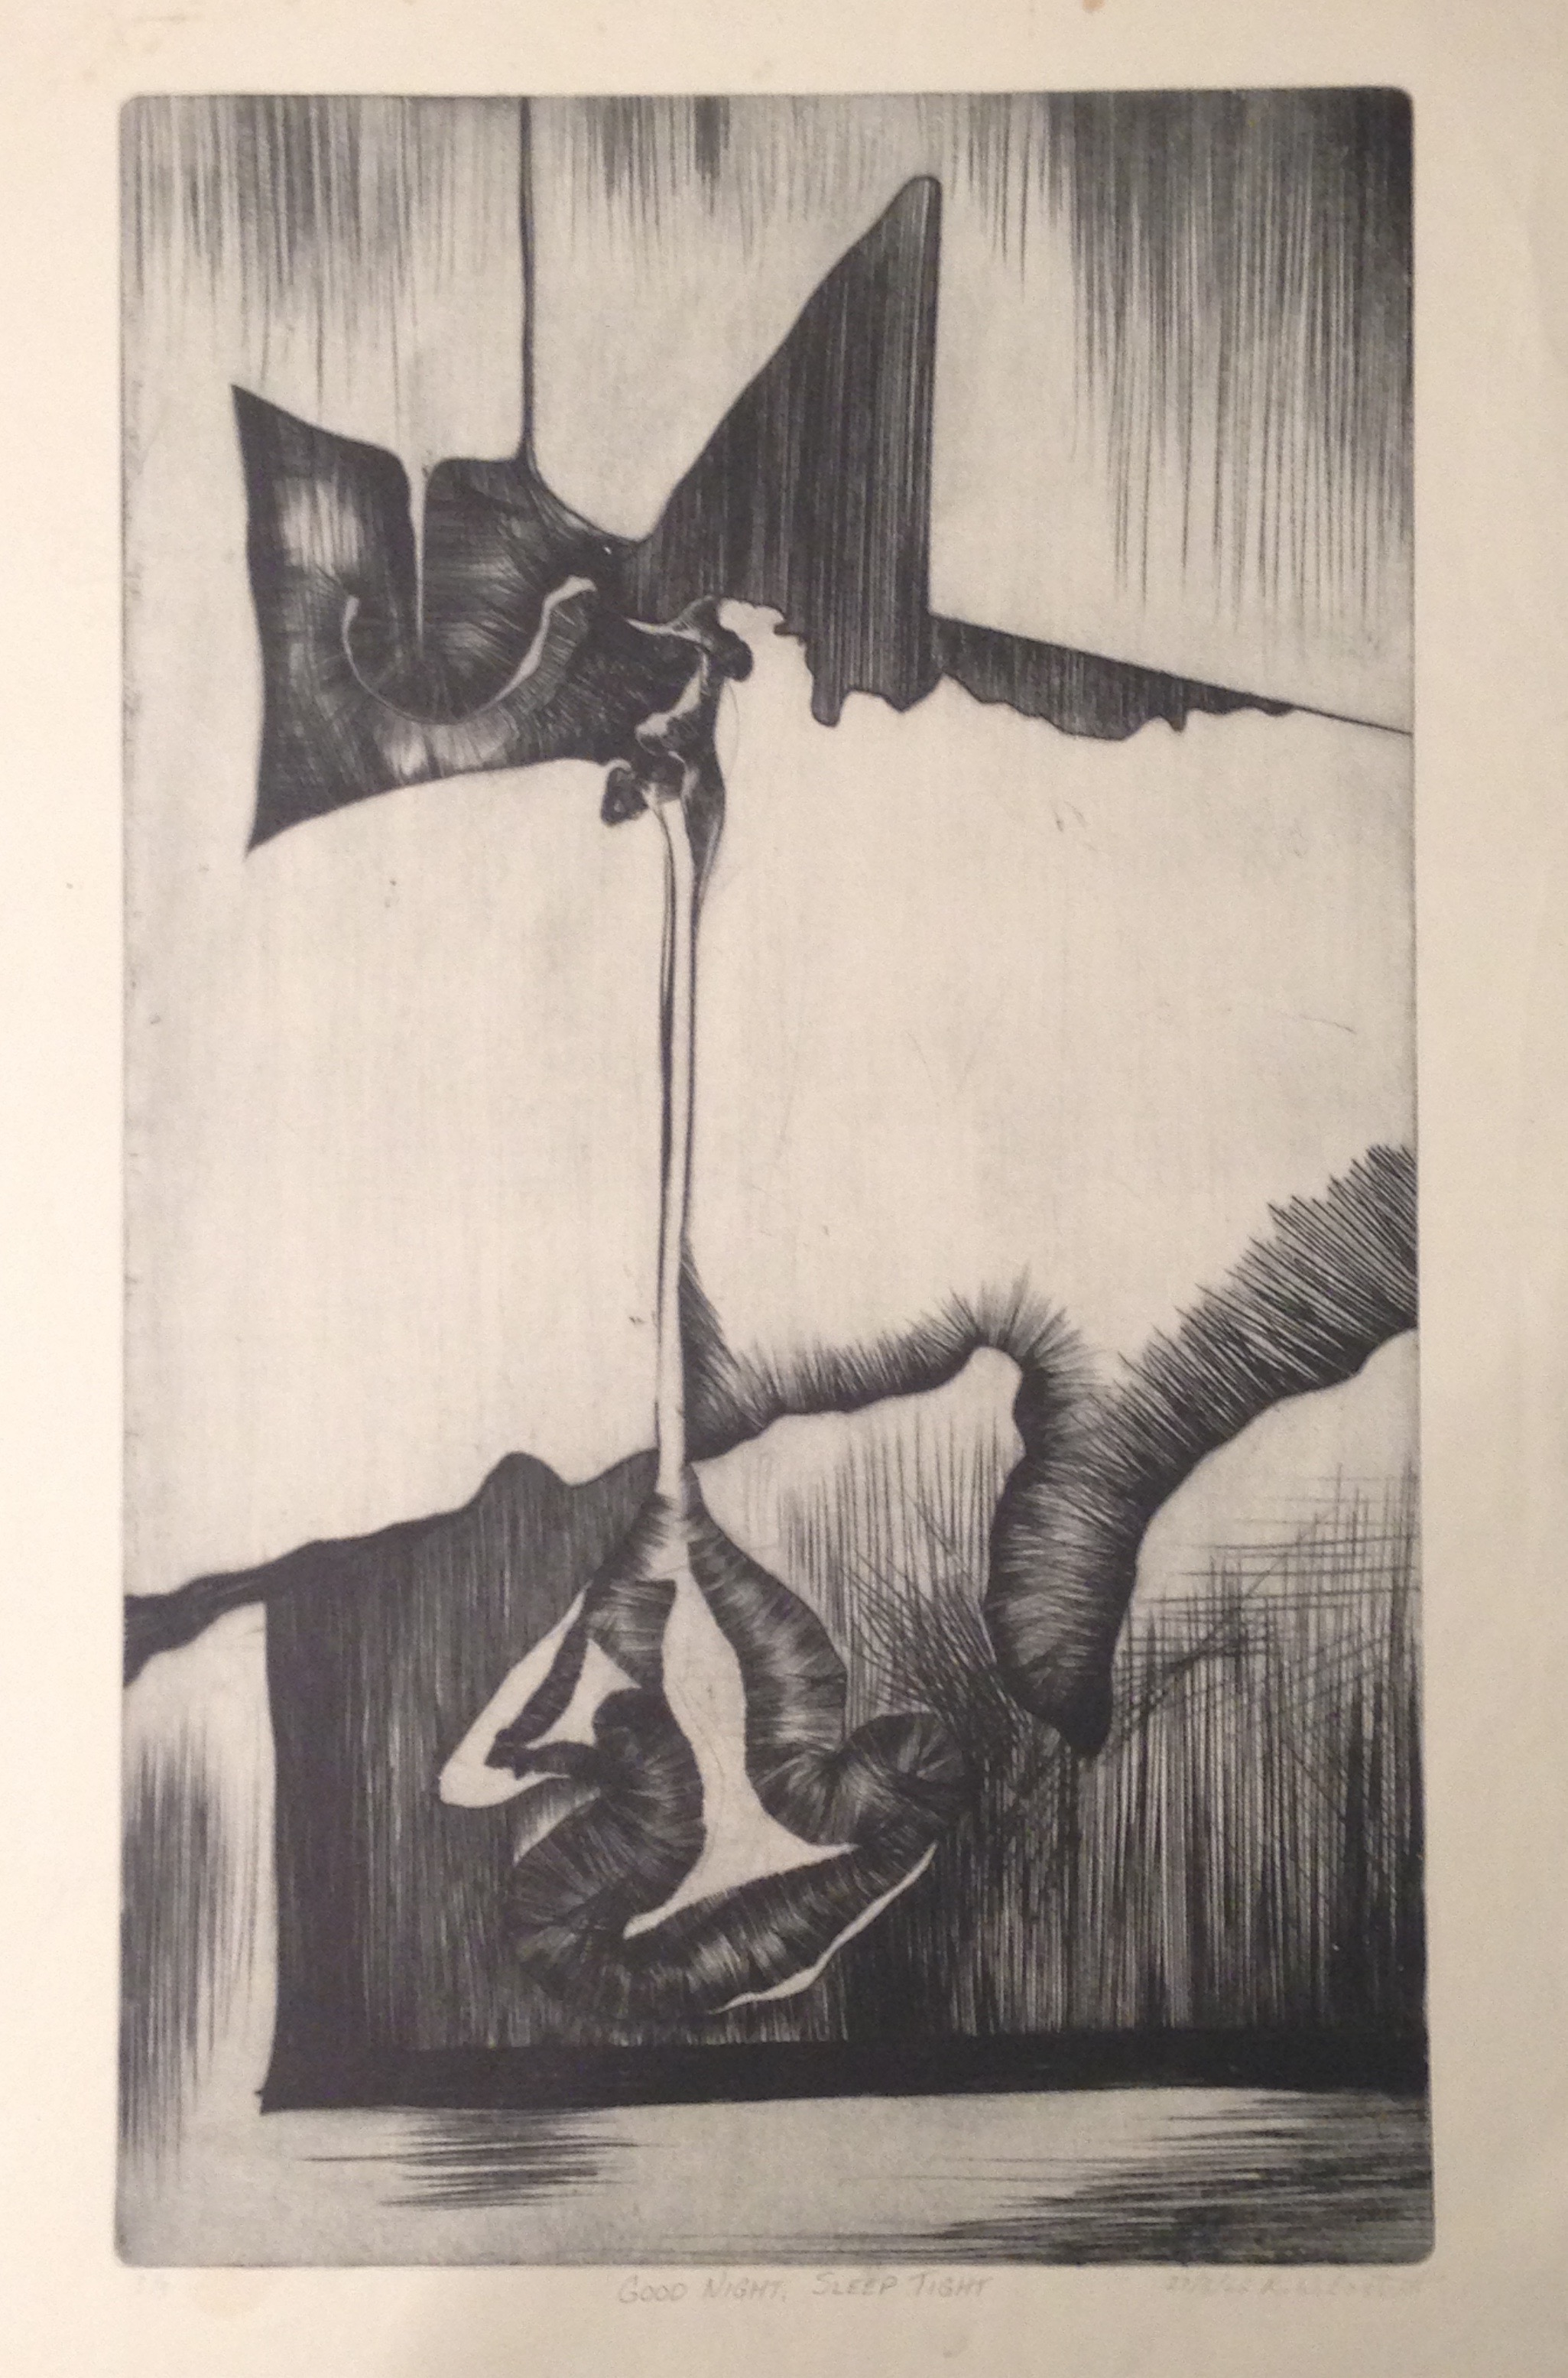 Wayne Eastcott, Good Night Sleep Tight, 1966